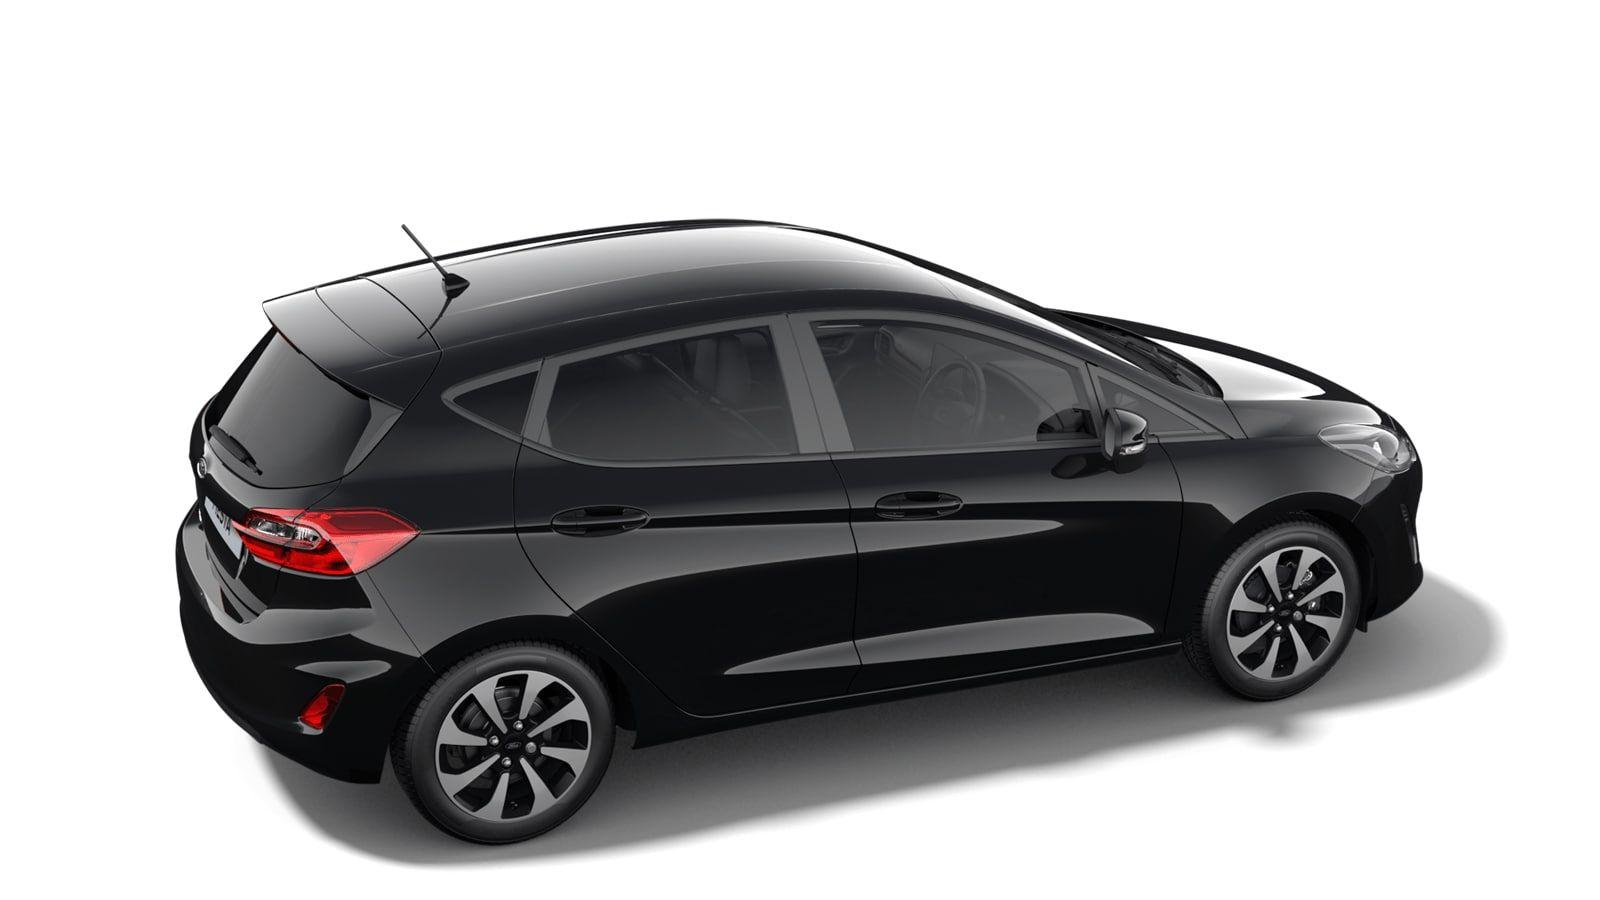 "Nieuw Ford All-new ford fiesta Connected 1.0i EcoBoost 95pk / 70kW M6 - 5d JKD - Metaalkleur ""Agate Black"" 2"